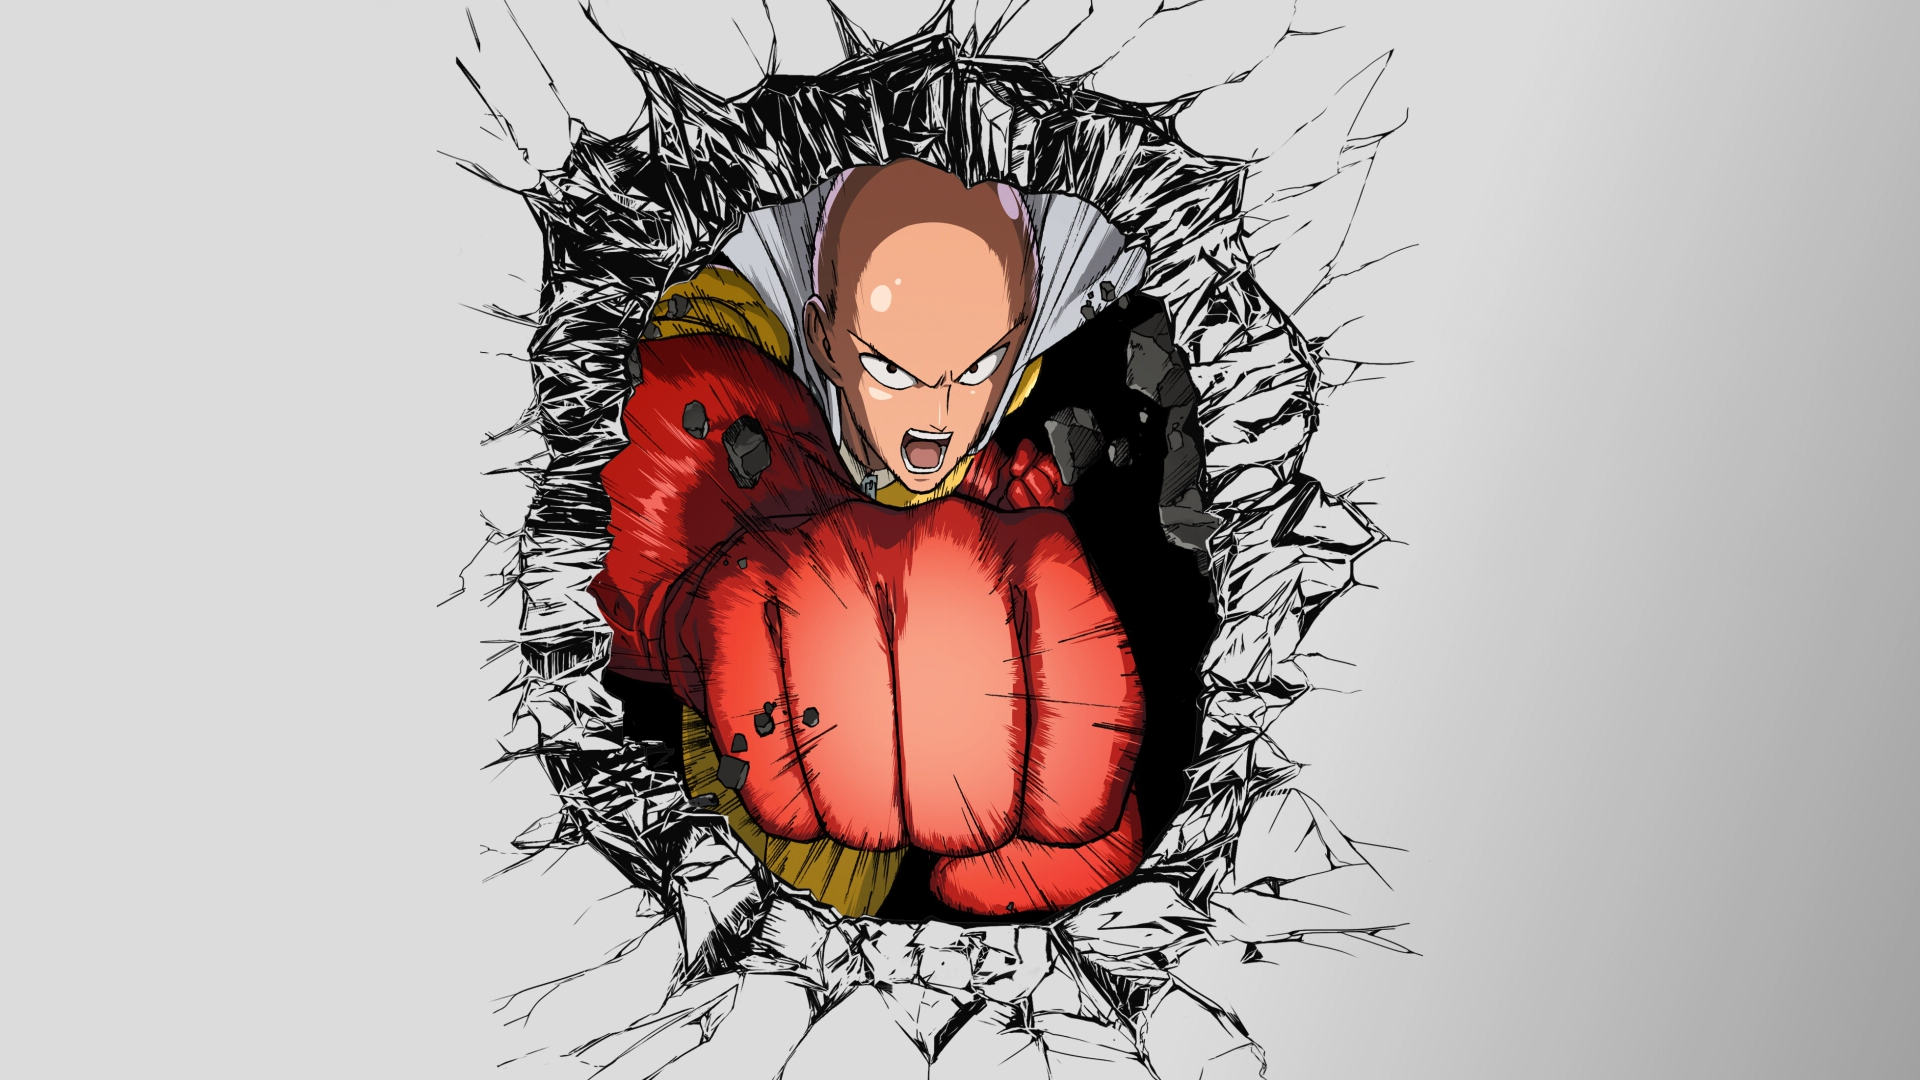 One-Punch Man Fond d'écran HD   Arrière-Plan   1920x1080   ID:689561 - Wallpaper Abyss